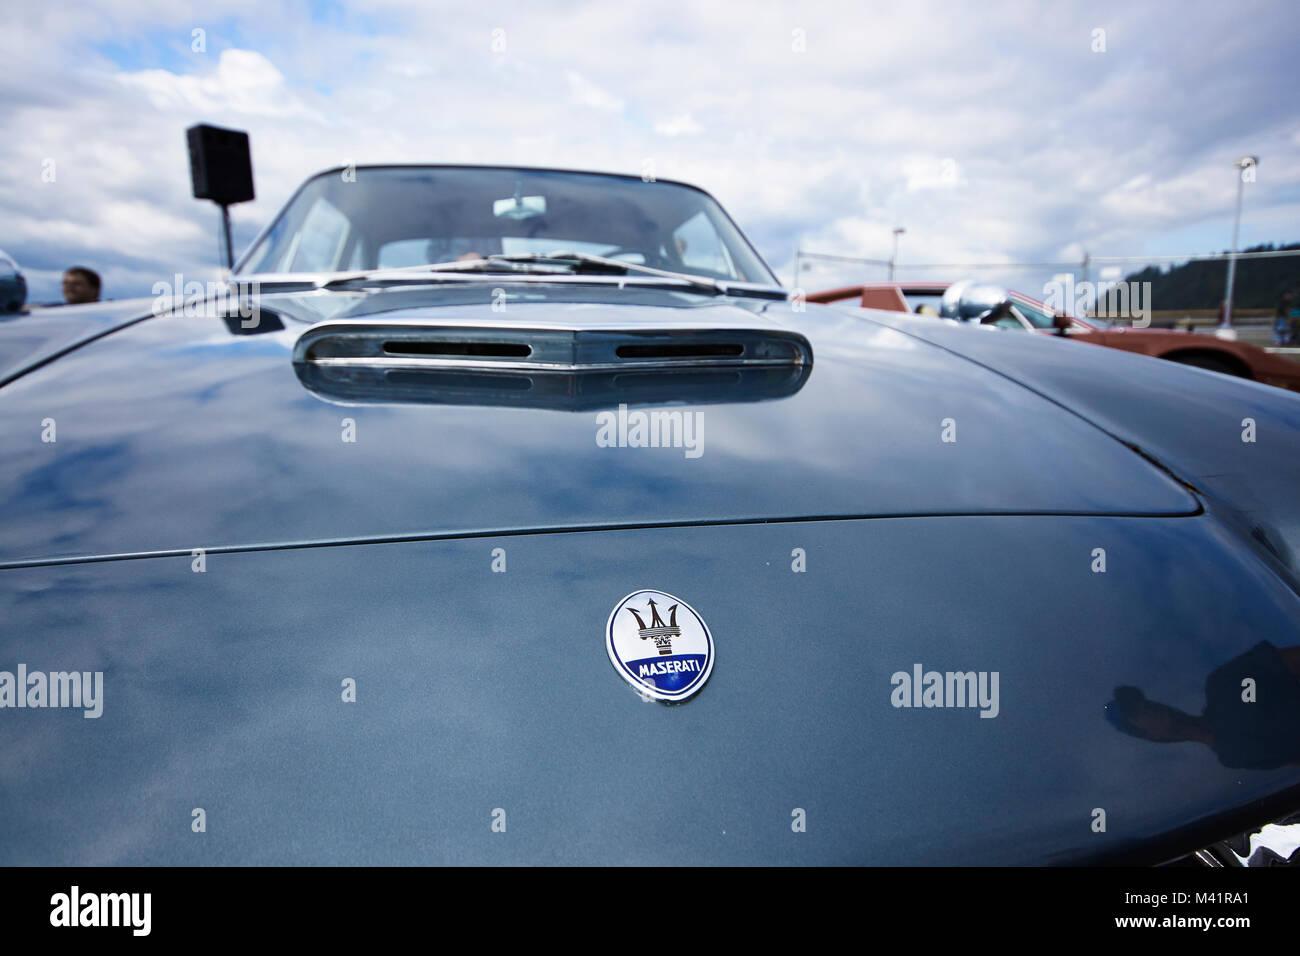 details of a 1961 Maserati 3500 GTi gran turismo - Stock Image